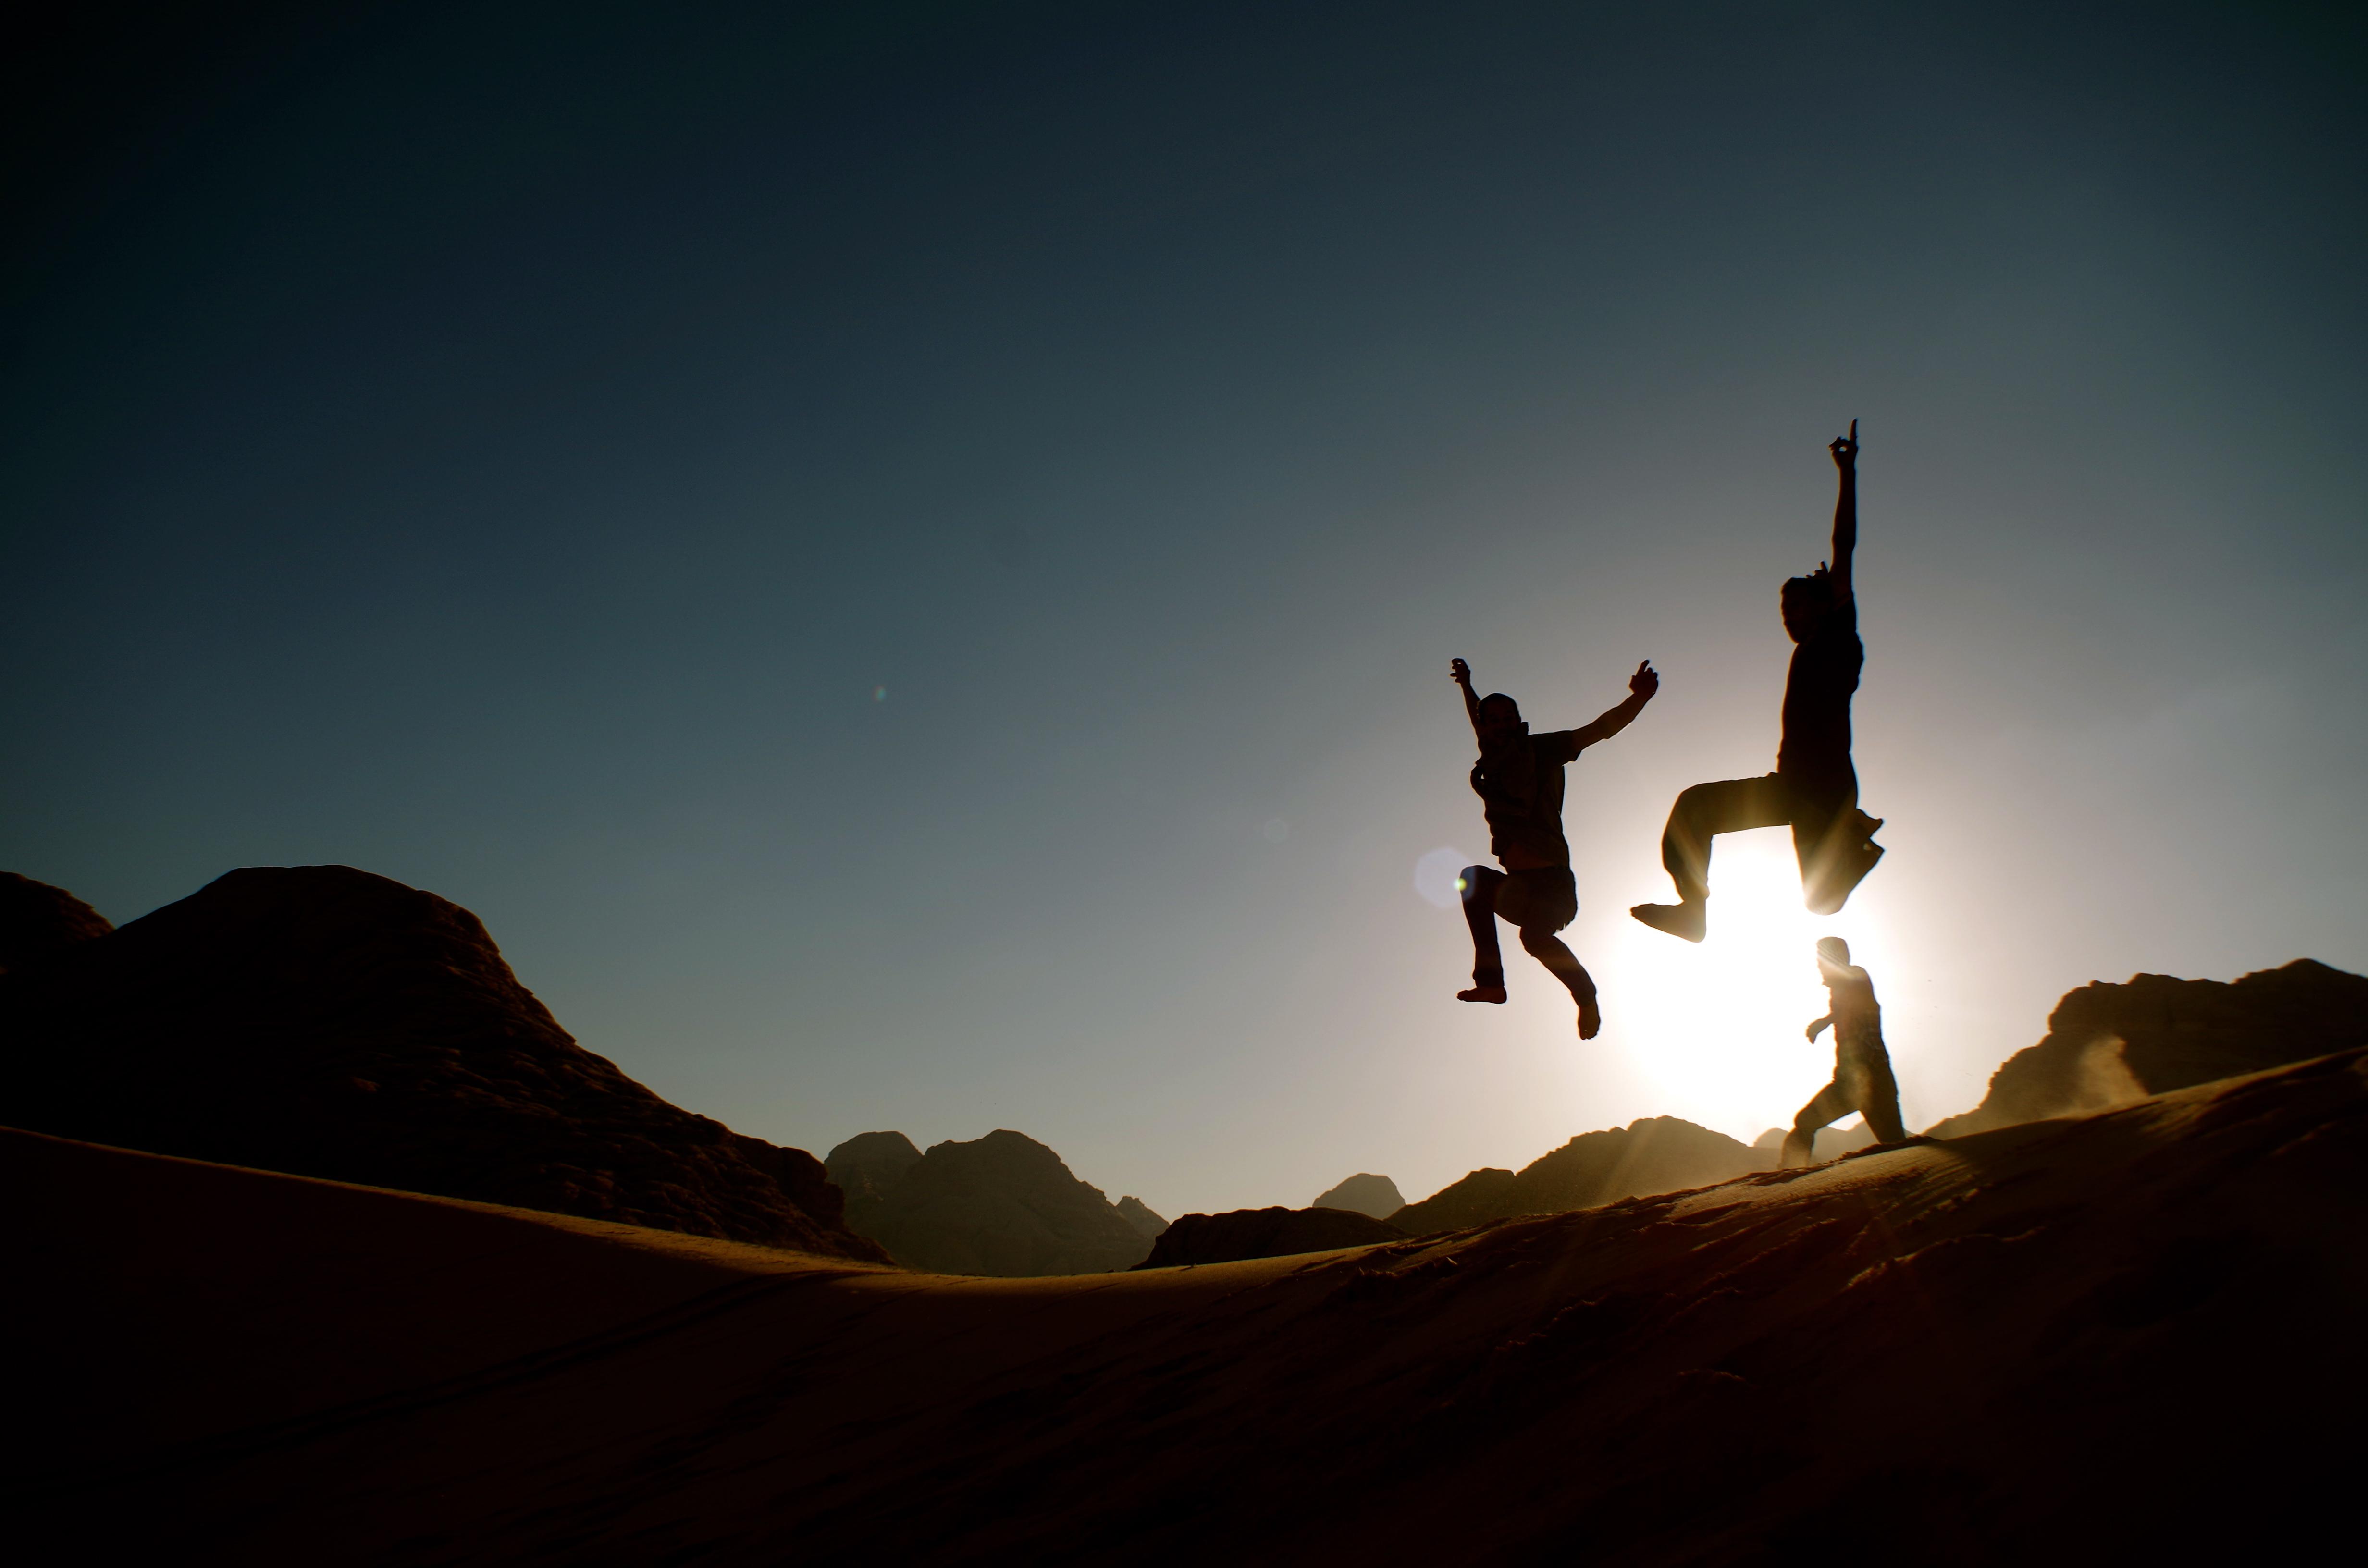 le désert wadi rum jordanie